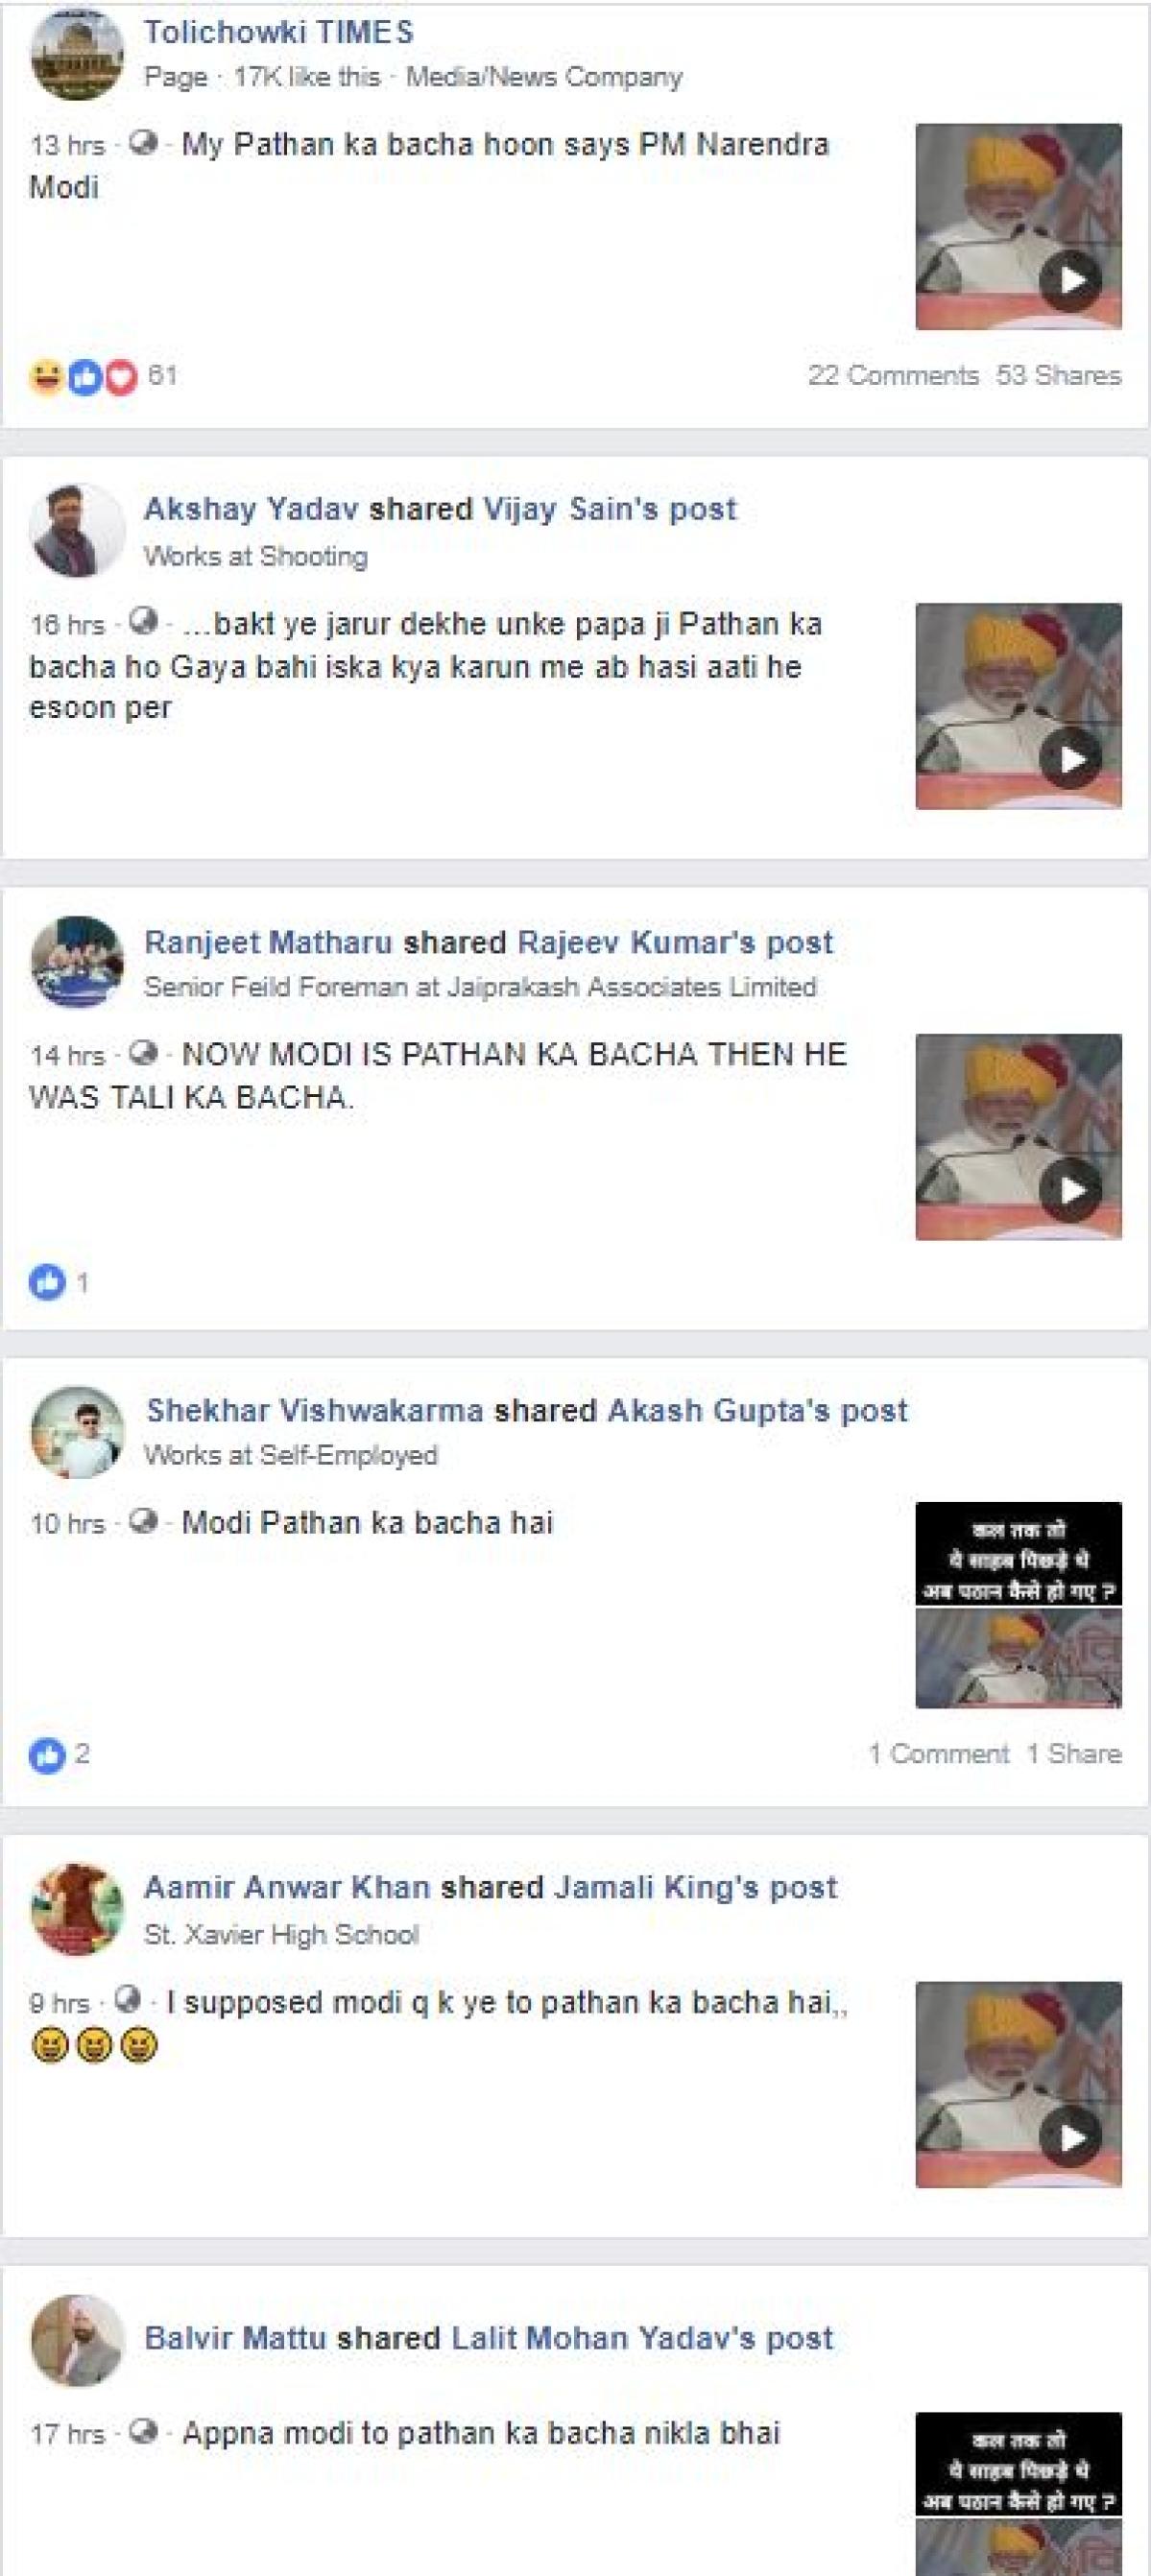 Viral Video Fact Check: No, PM Narendra Modi Did Not Refer